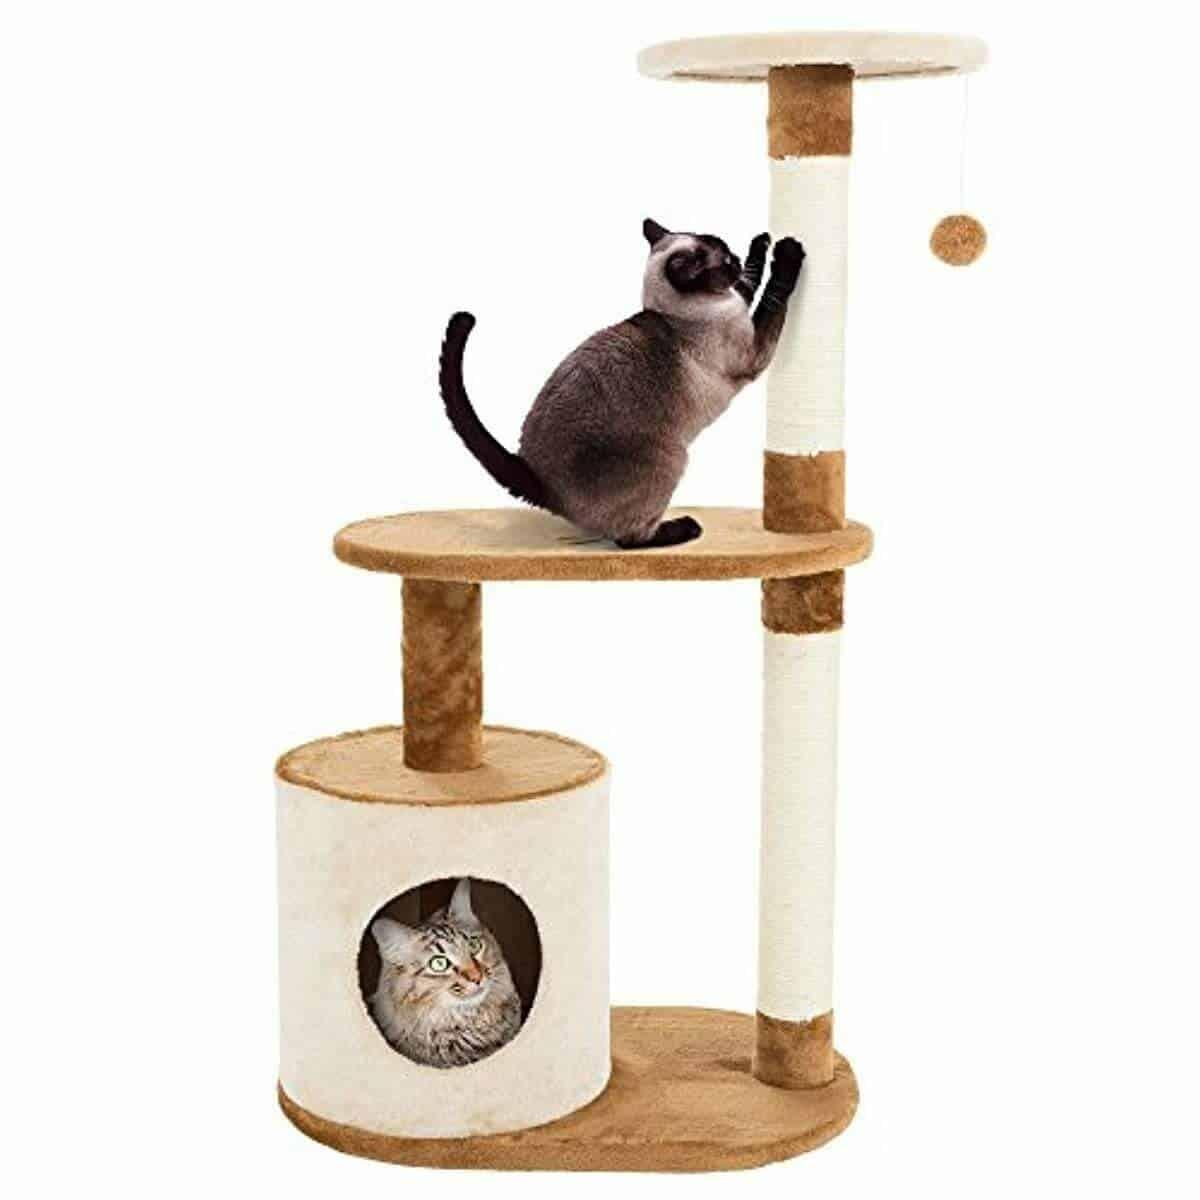 PETMAKER Cat Tree Condo 3 Tier with Condo & Scratching Posts